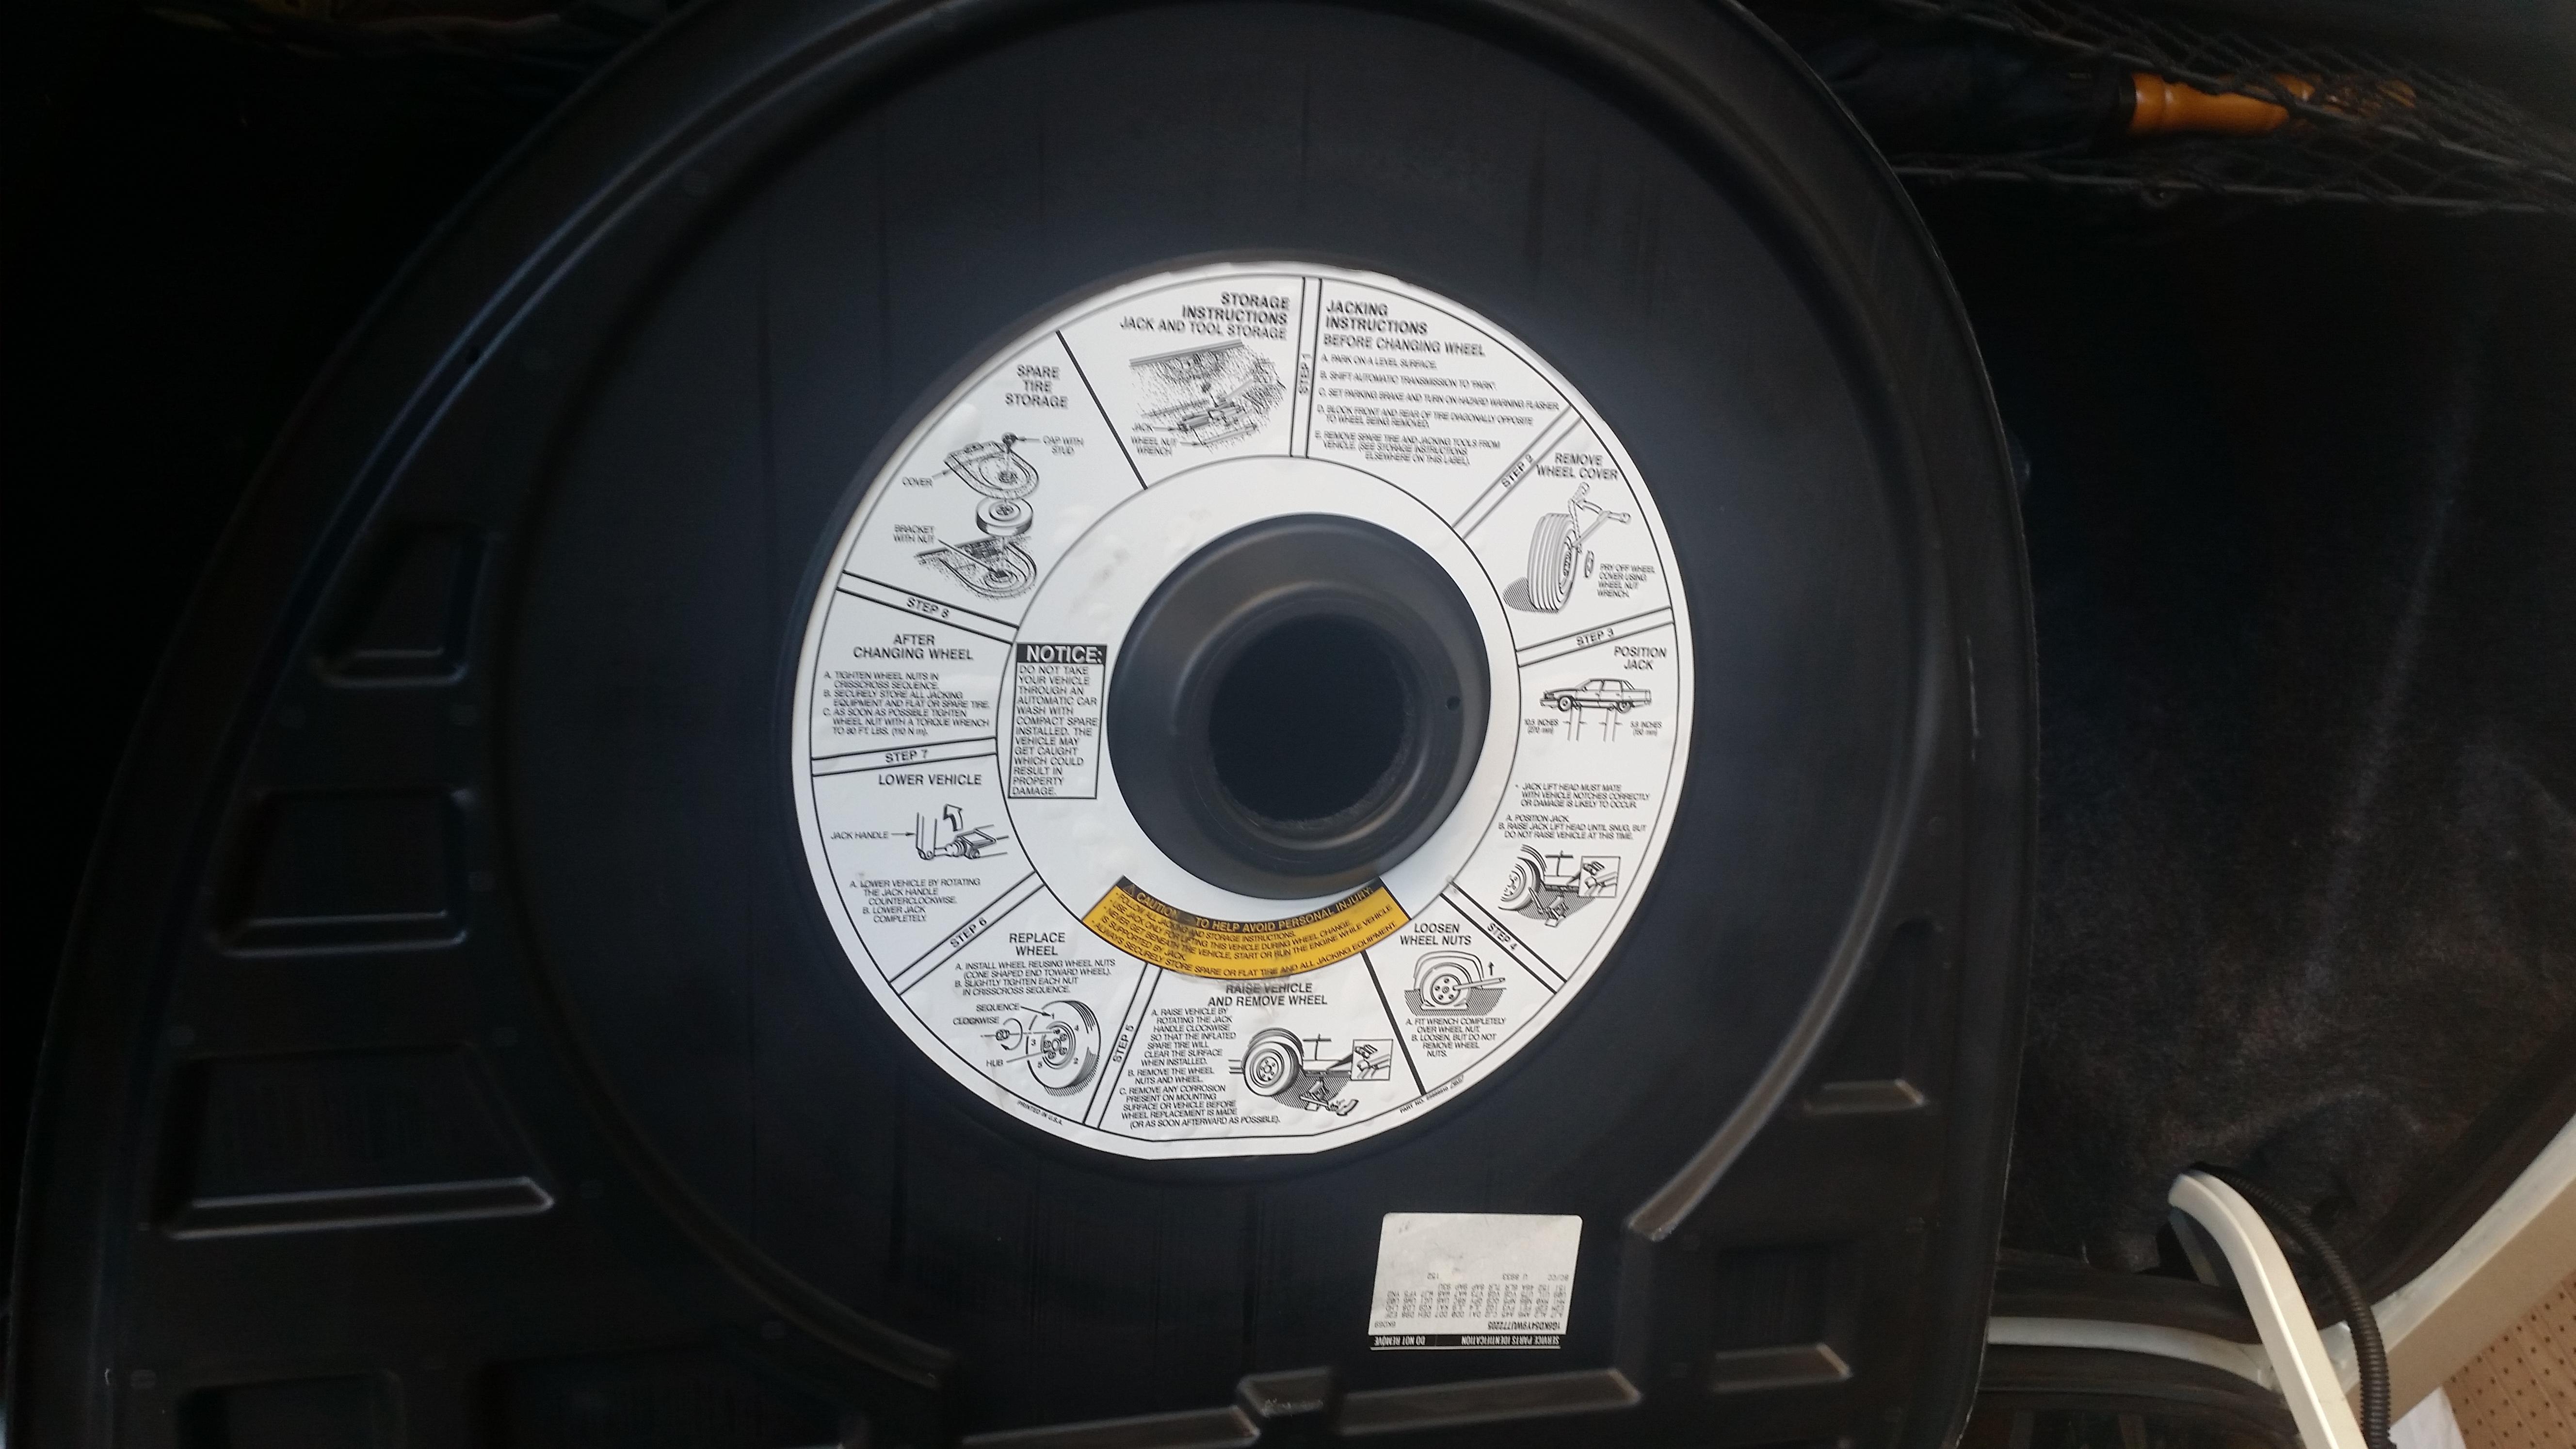 20151226_140126 installing aftermarket radio gps hu on deville 1999 1999 Sedan Deville at nearapp.co